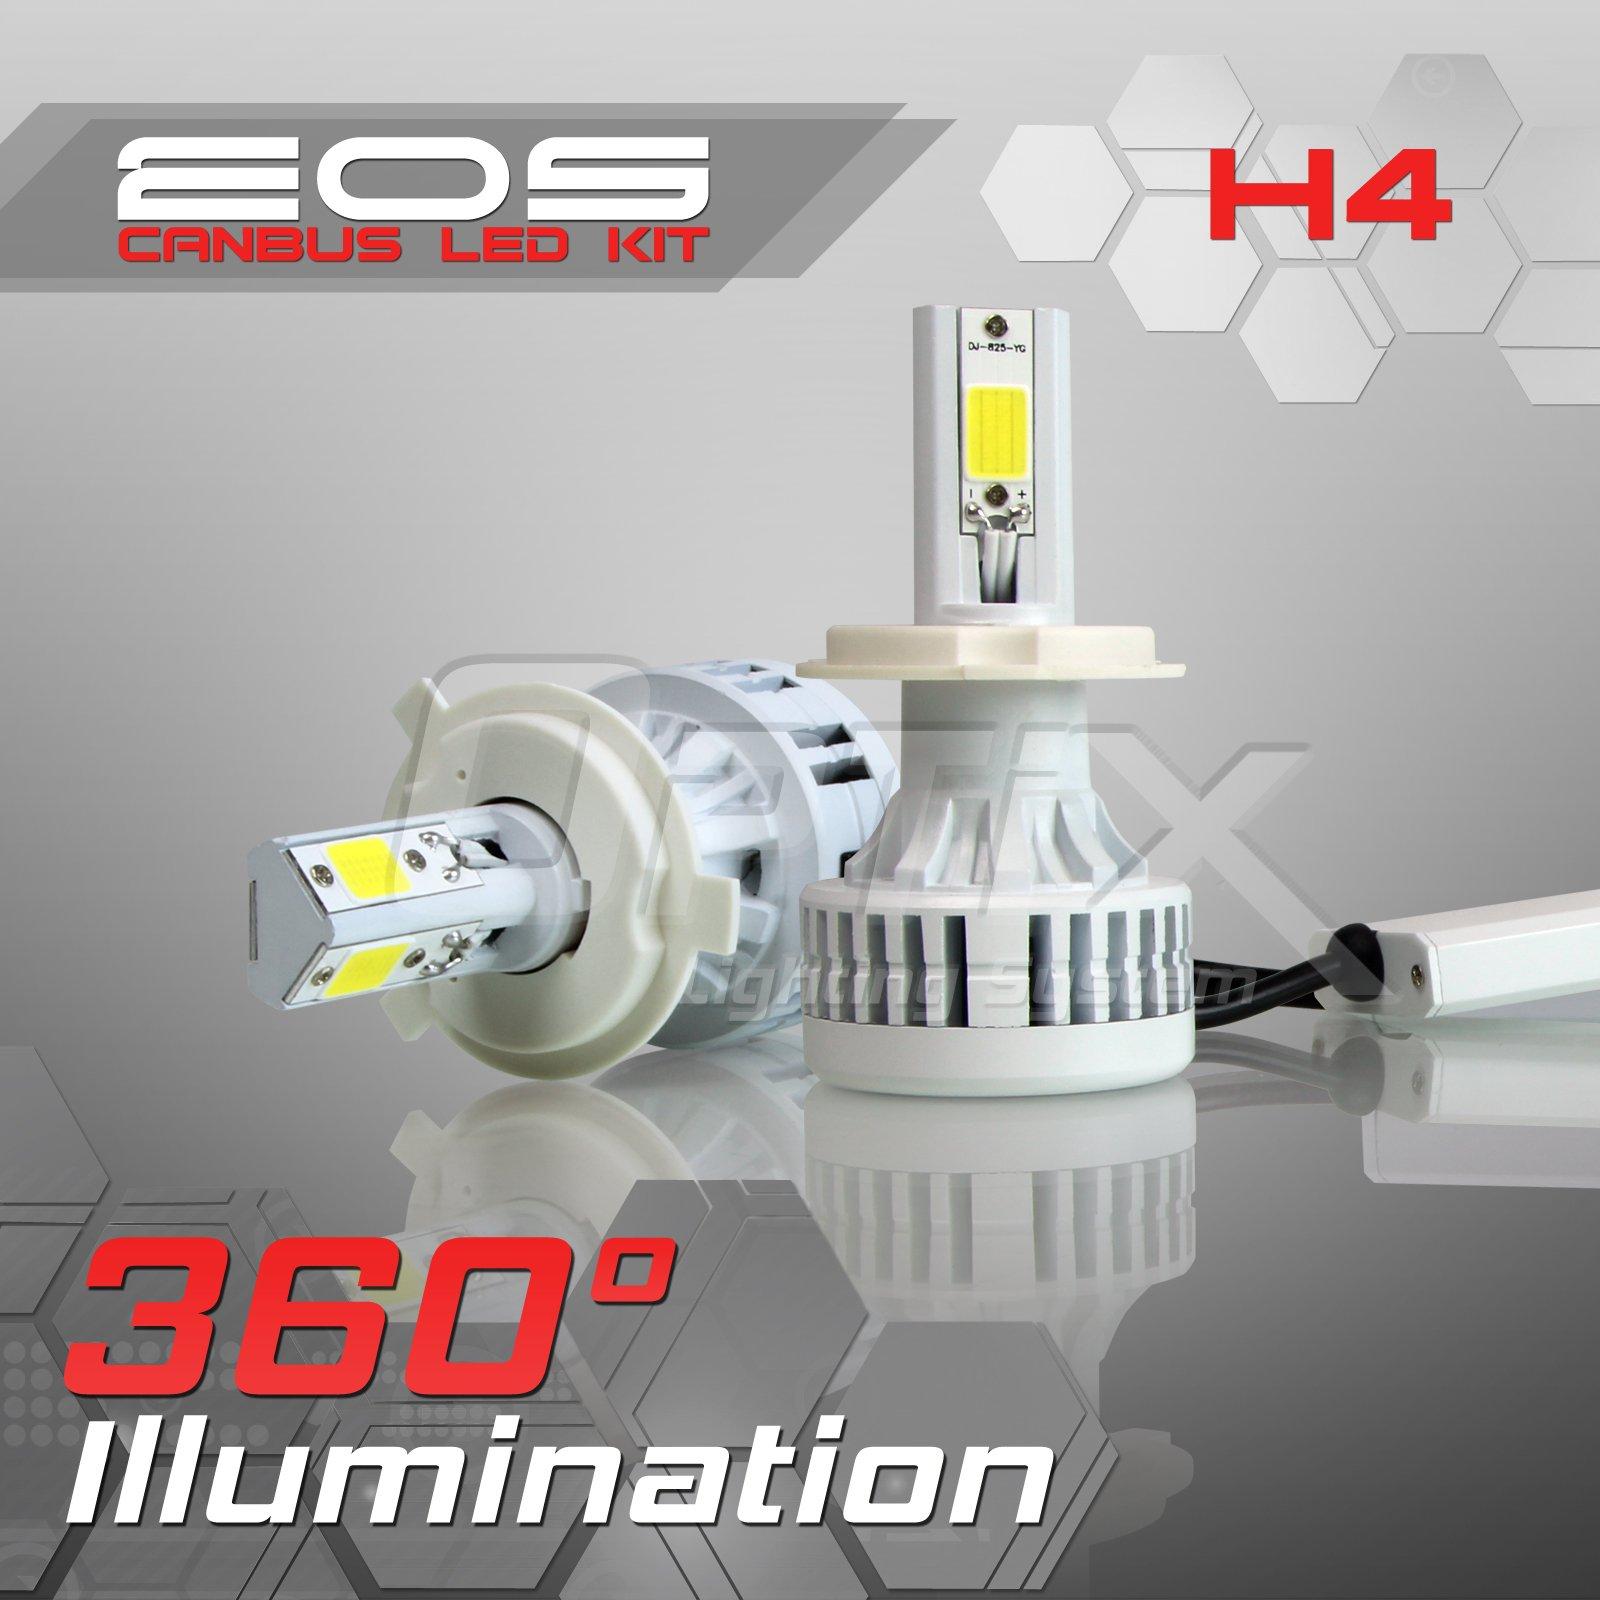 Optix 80W 8000LM LED Headlight Conversion Kit - H4 HB2 9003 Dual Hi/Lo Beam Bulbs - 6000K 6K Diamond White - Premium Epistar COB Chip - Canbus Chip Error Free No Flicker Plug and Play Design